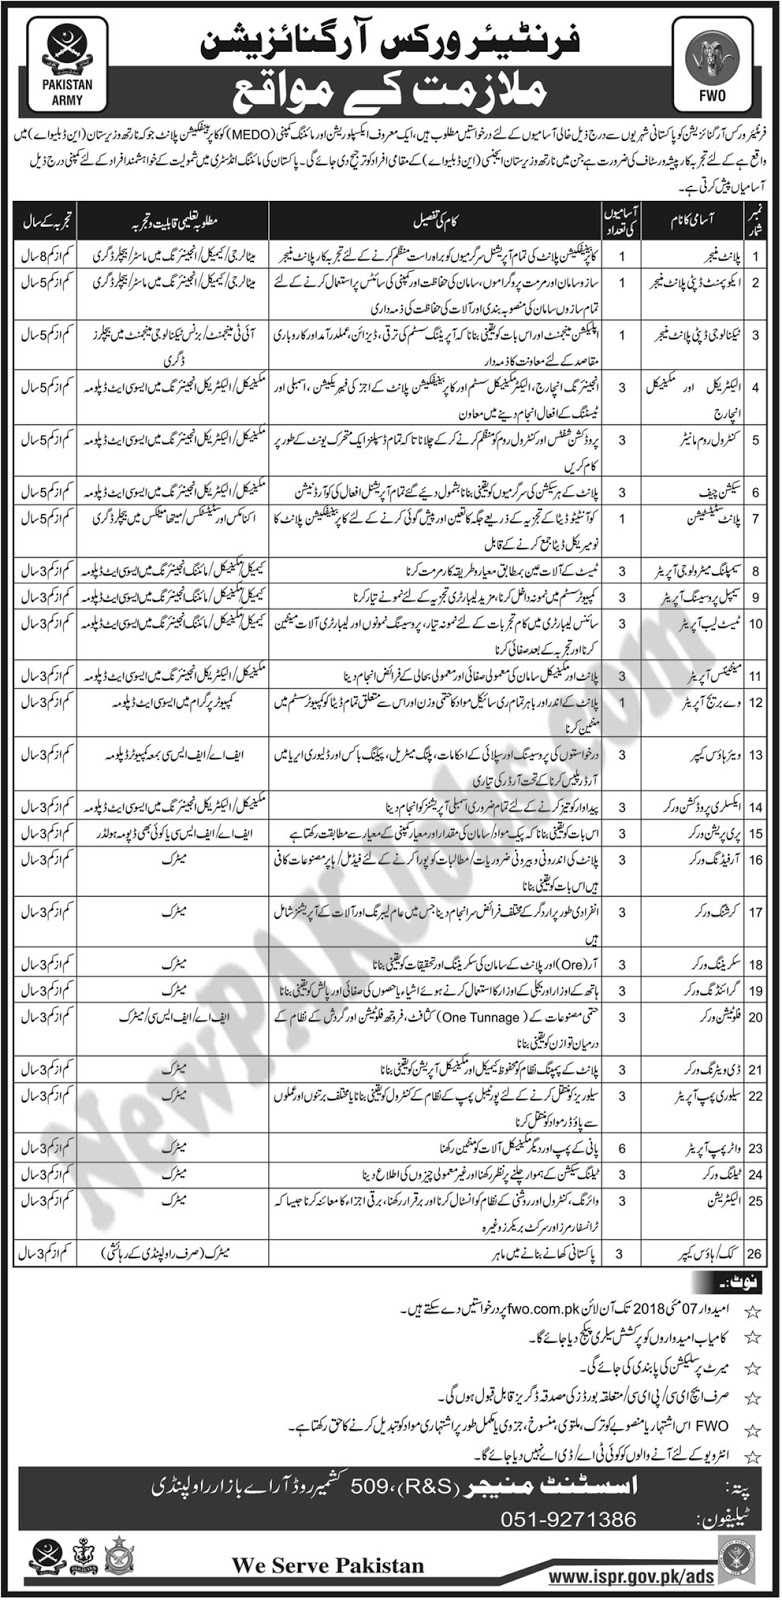 frontier-works-organization-latest-jobs-apply-online-for-71-vacancies-from-across-pakistan